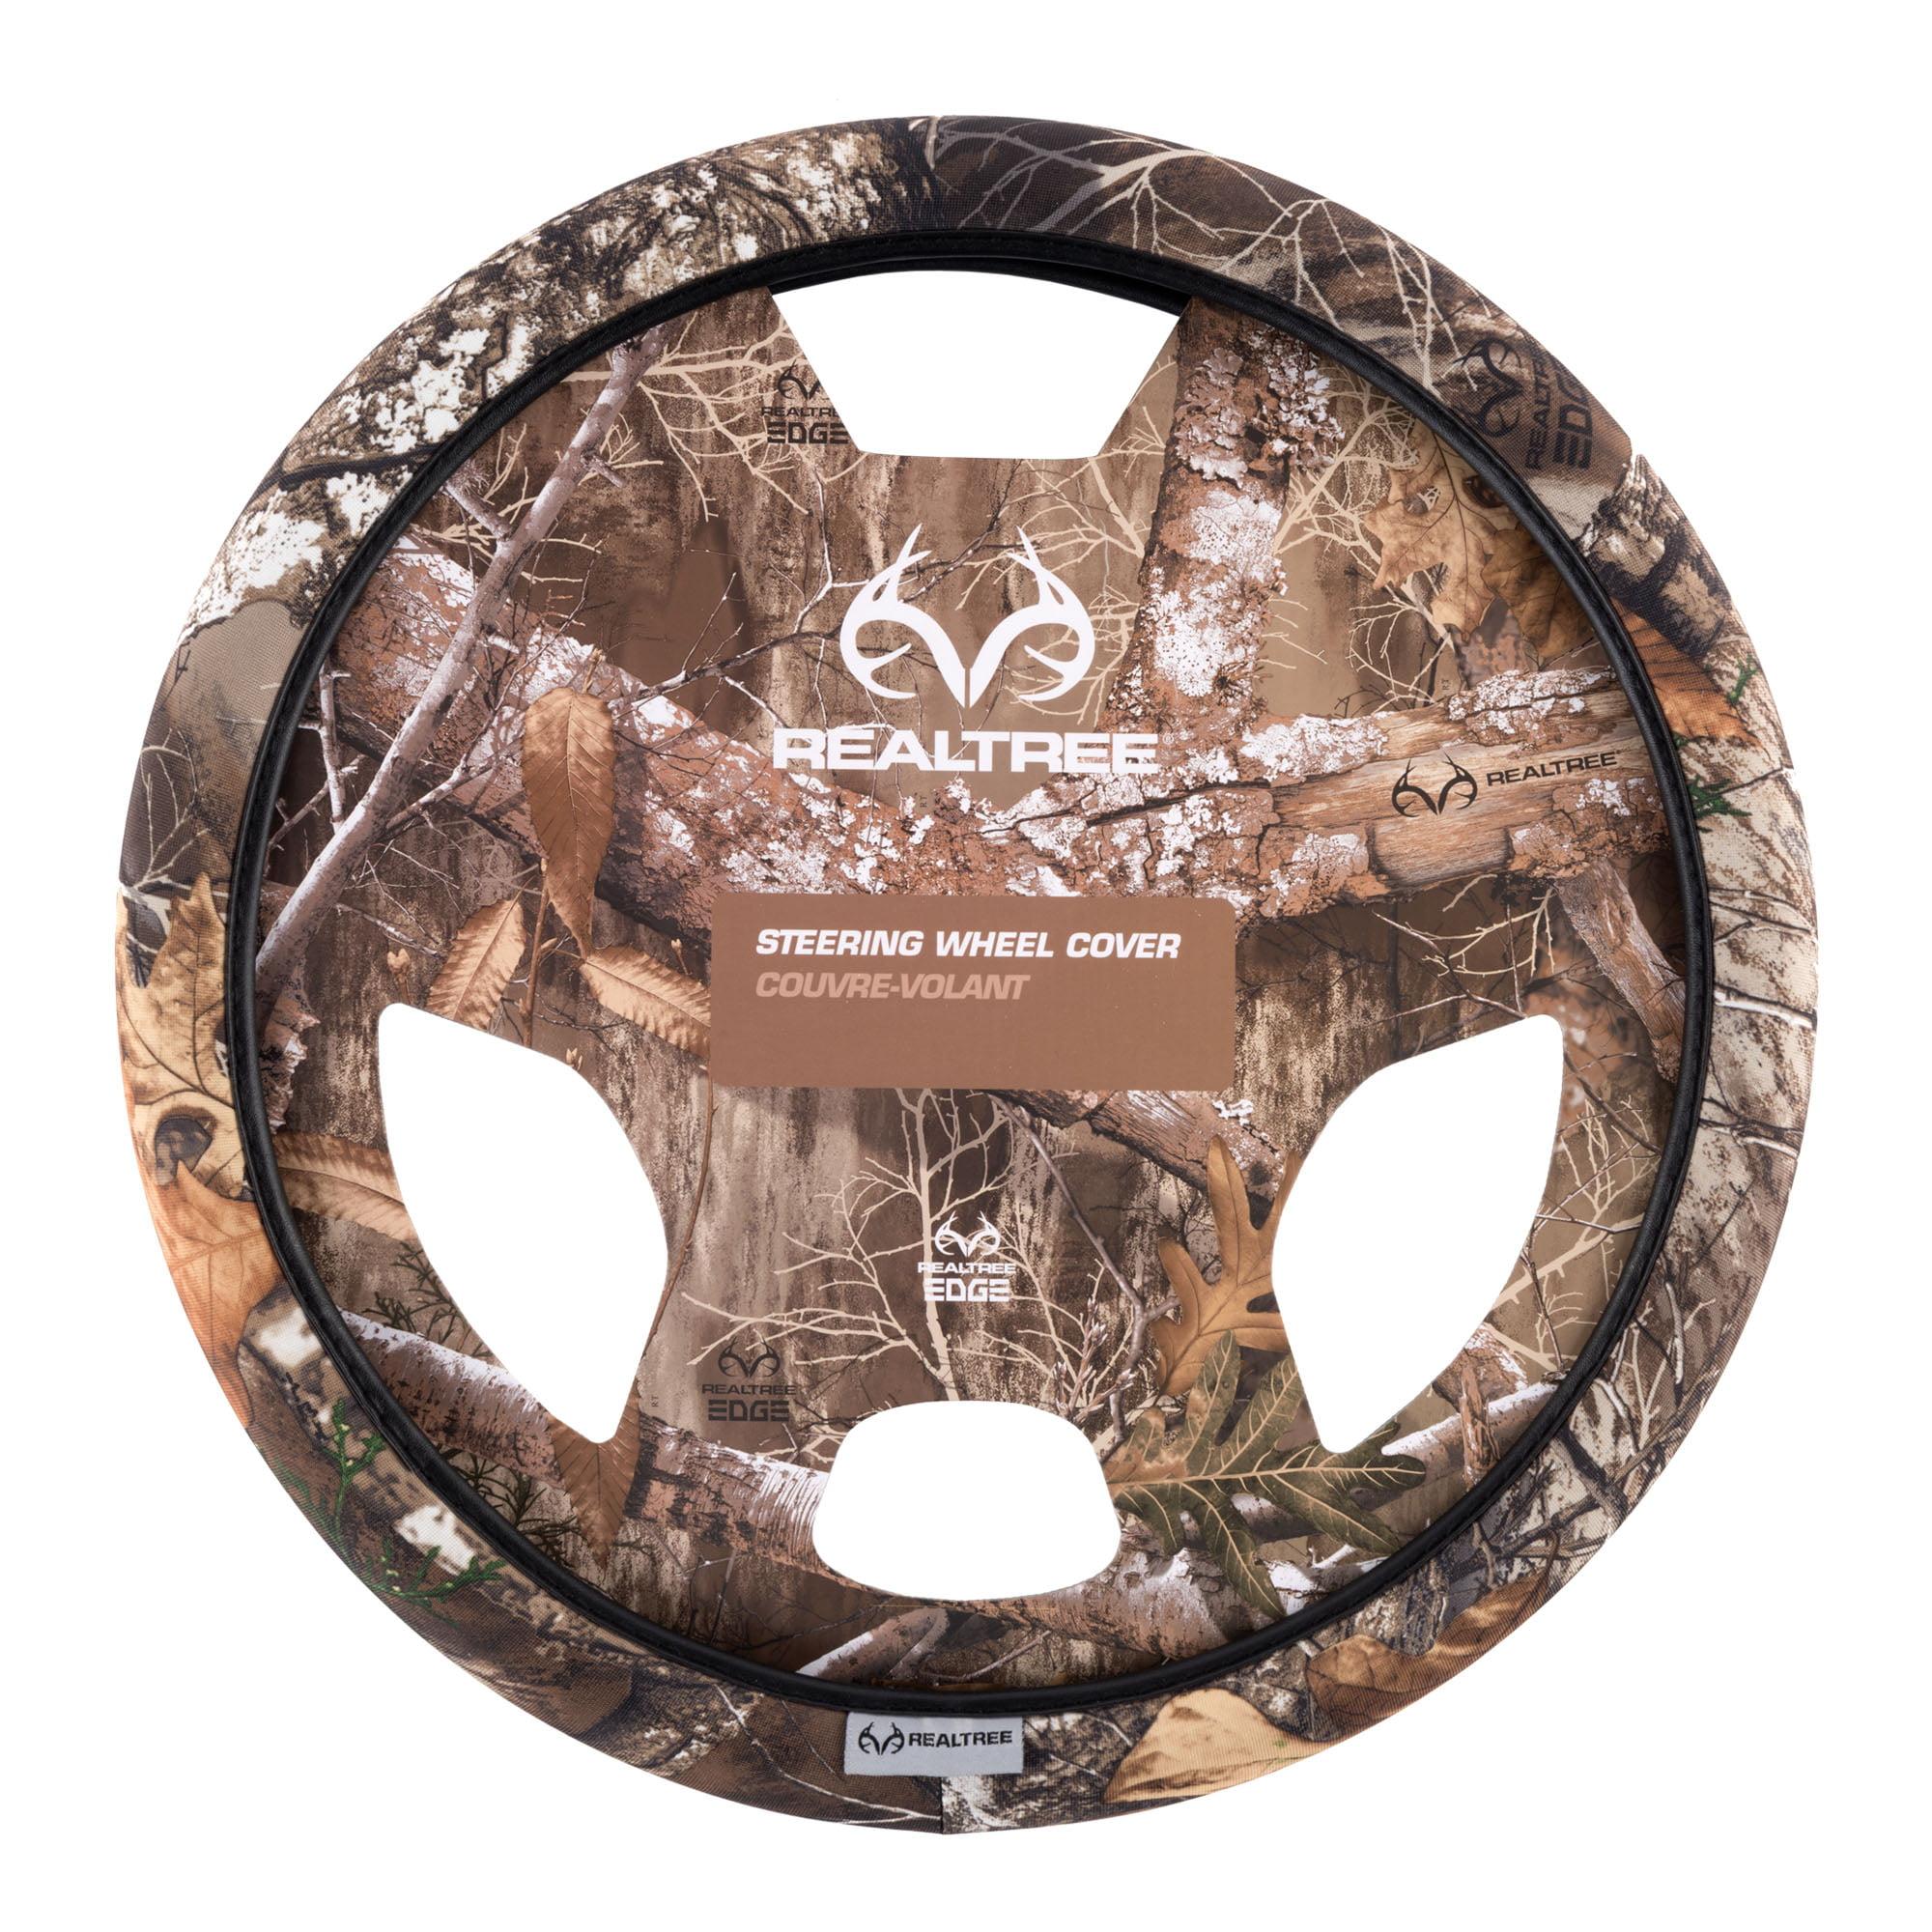 Realtree Camo Steering Wheel Cover